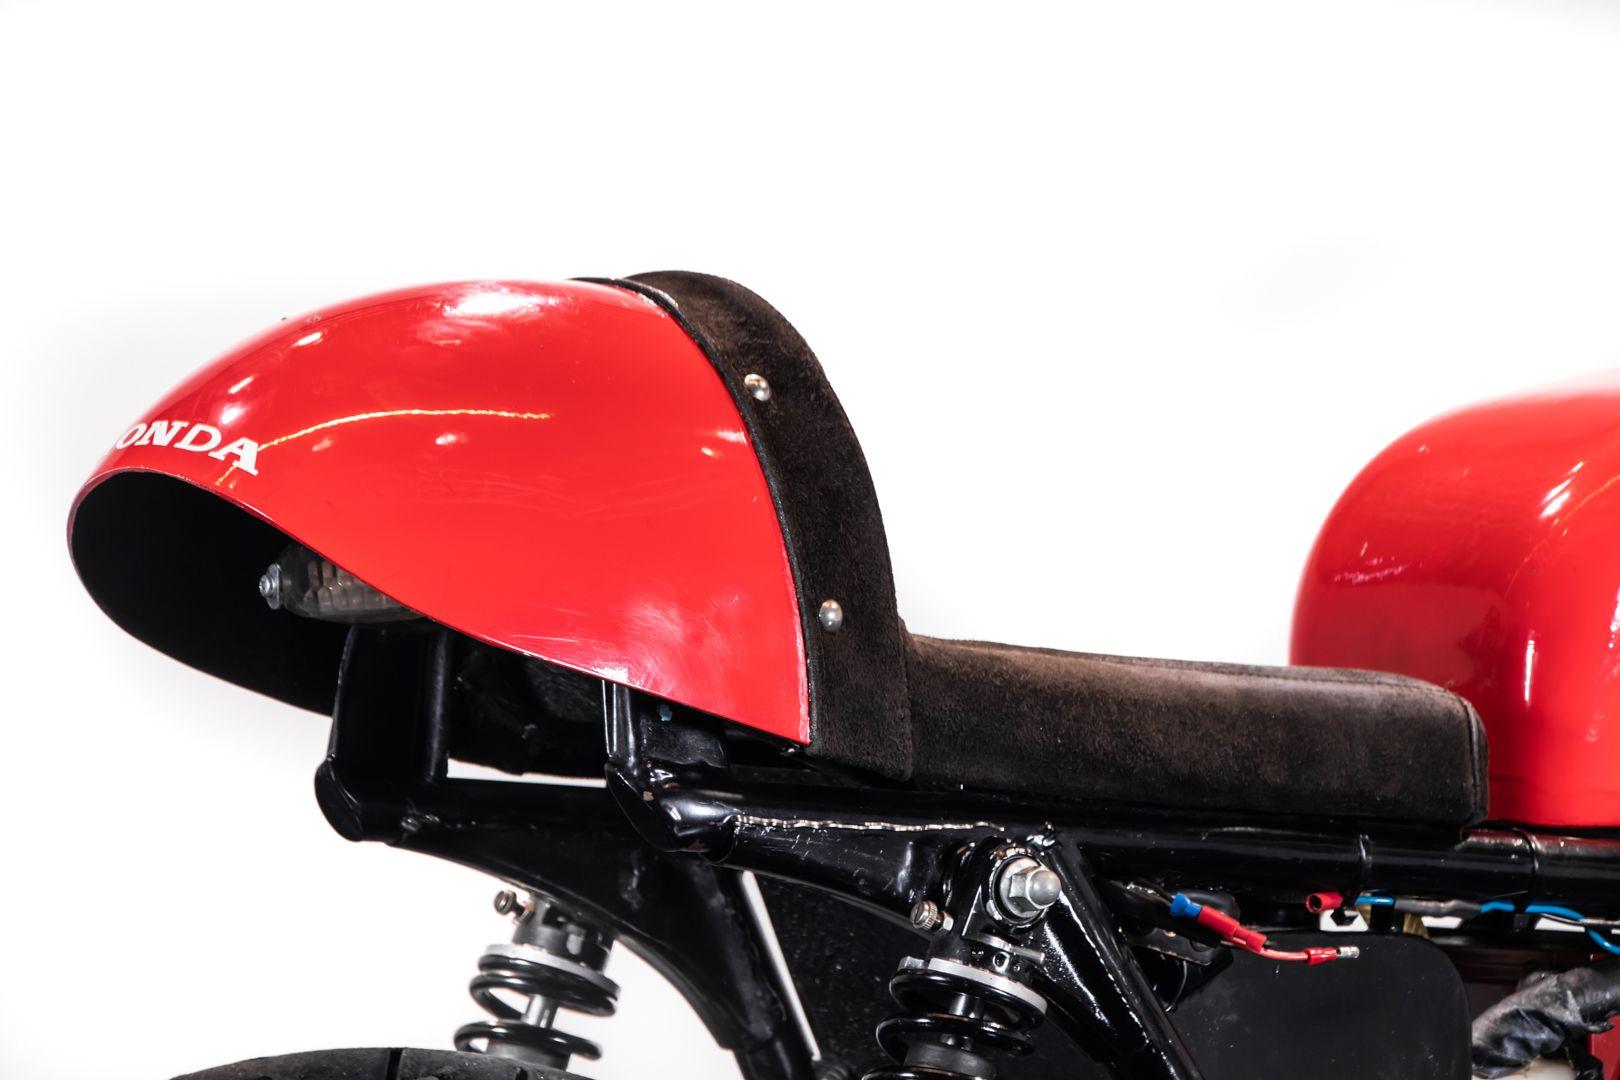 1973 Honda 750 Daytona Replica 72317